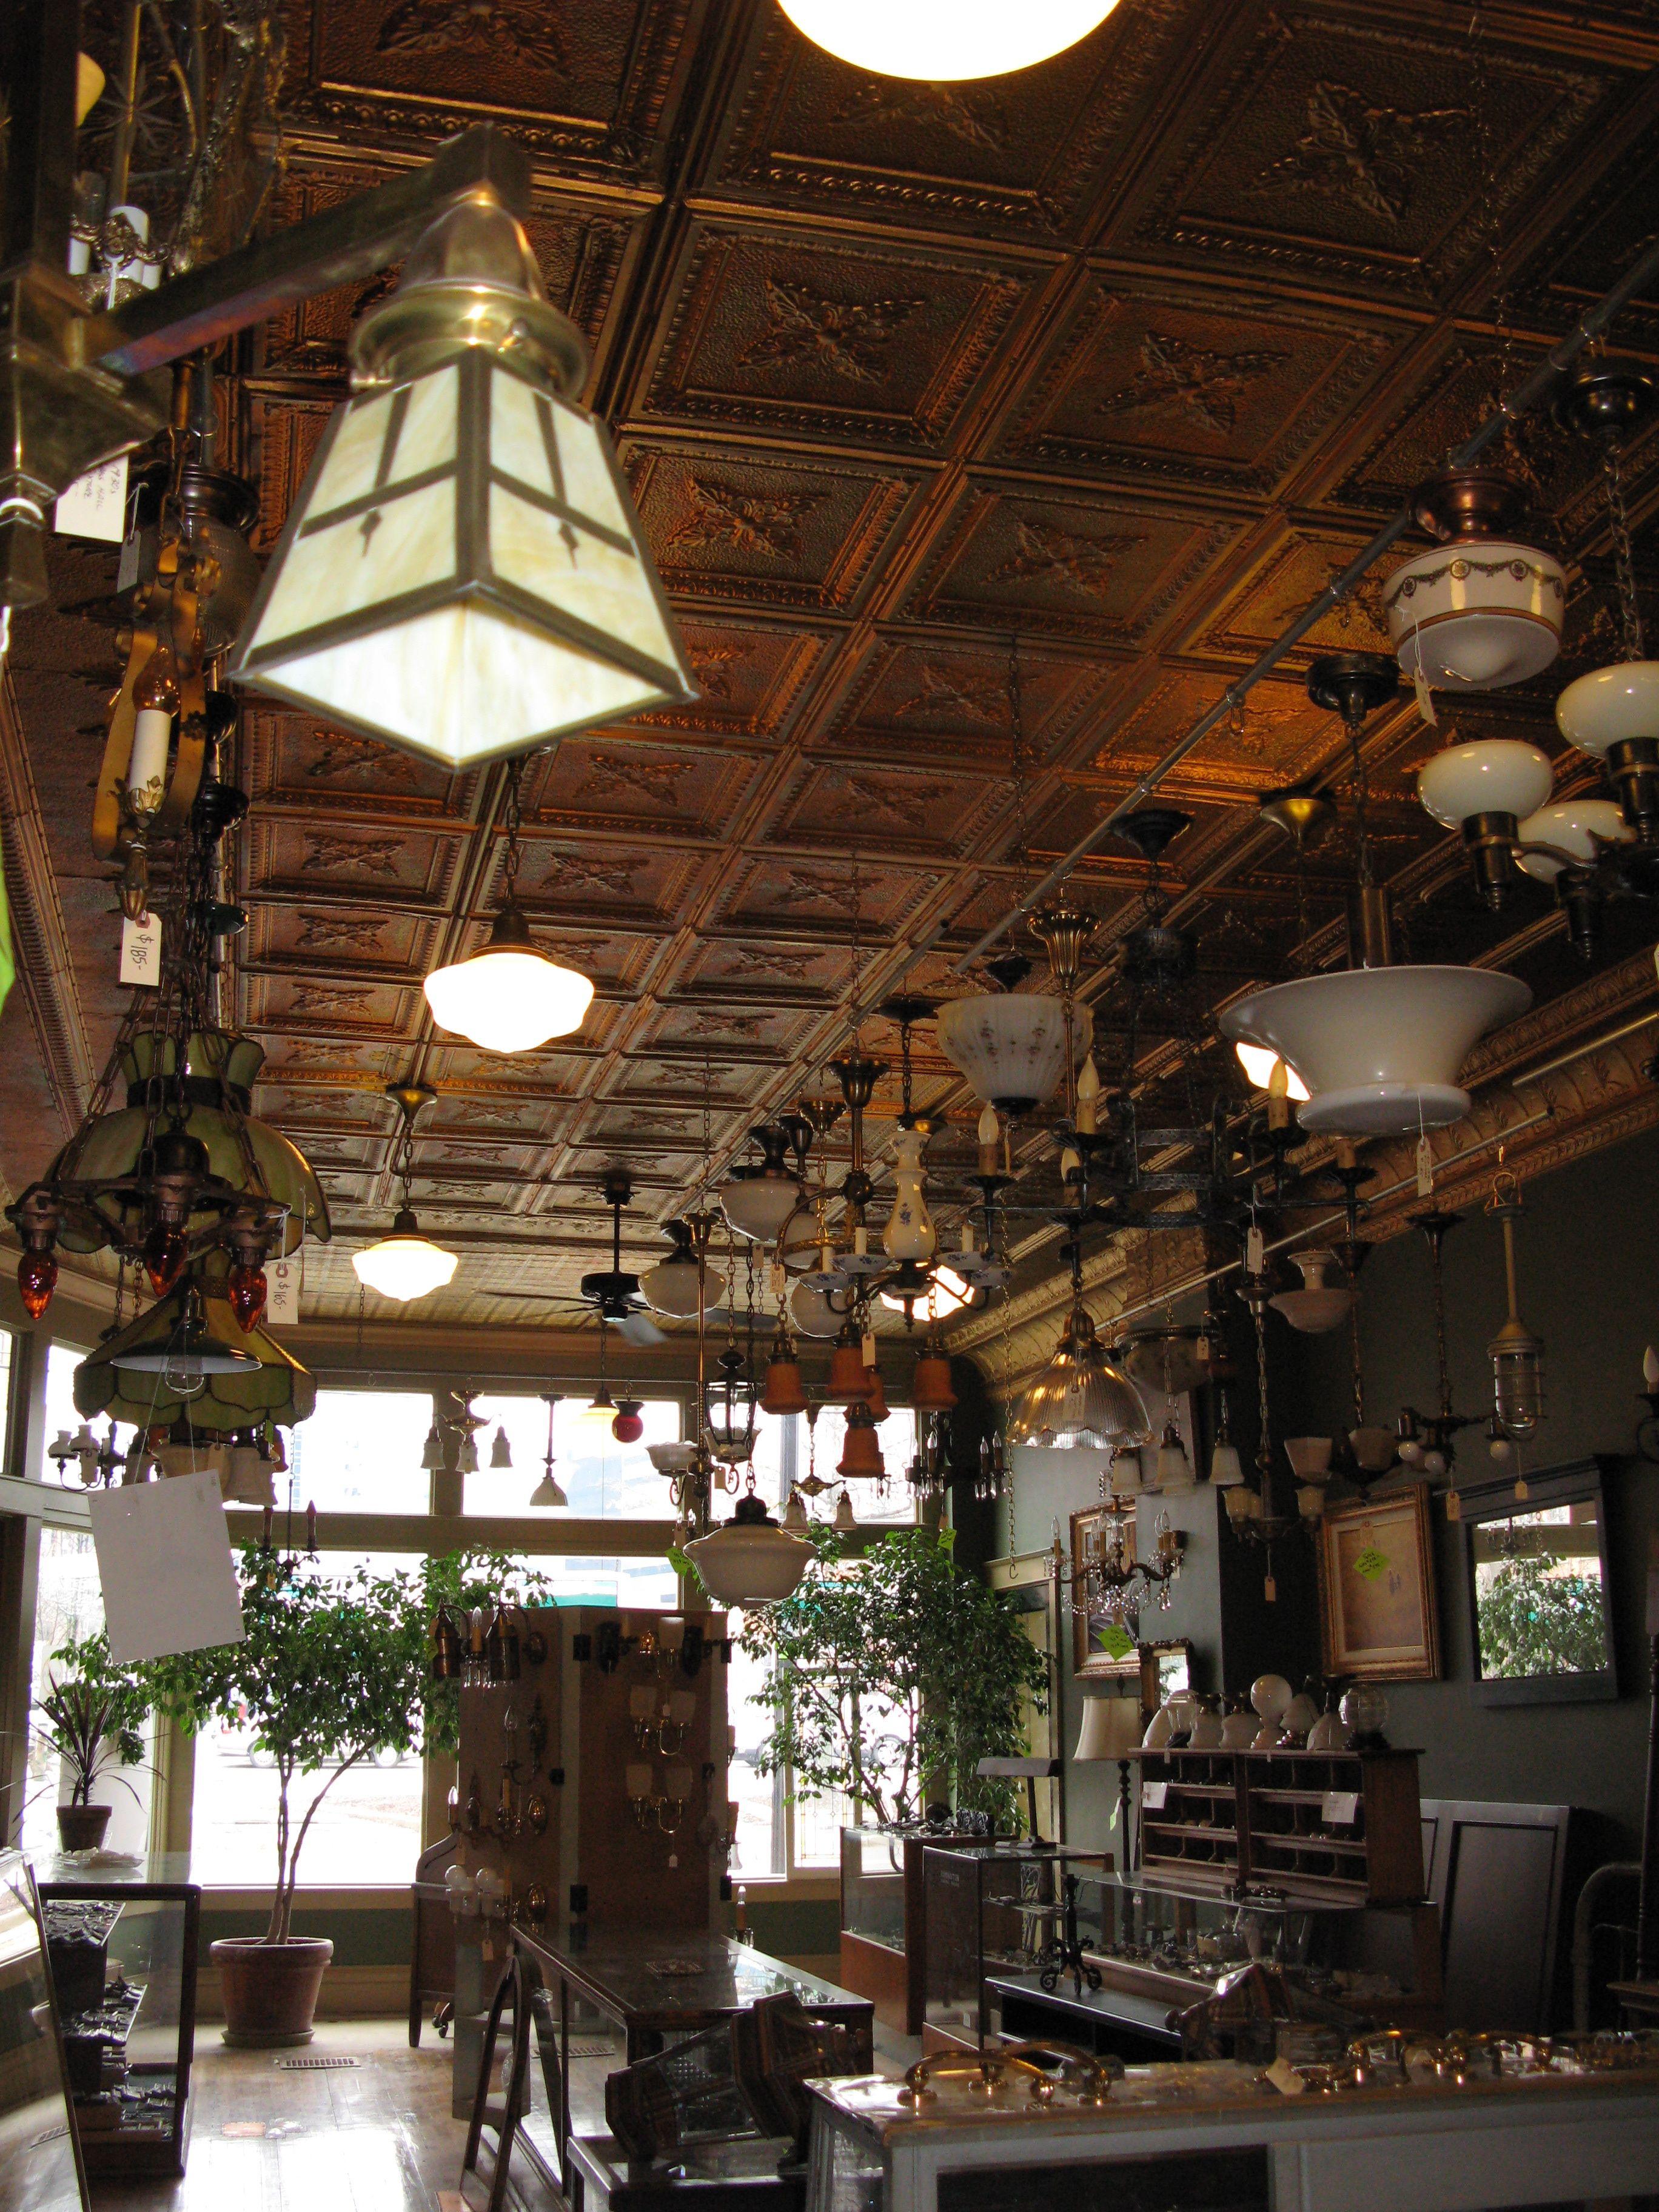 The Heritage Company, architectural salvage in Kalamazoo, MI. Three ...